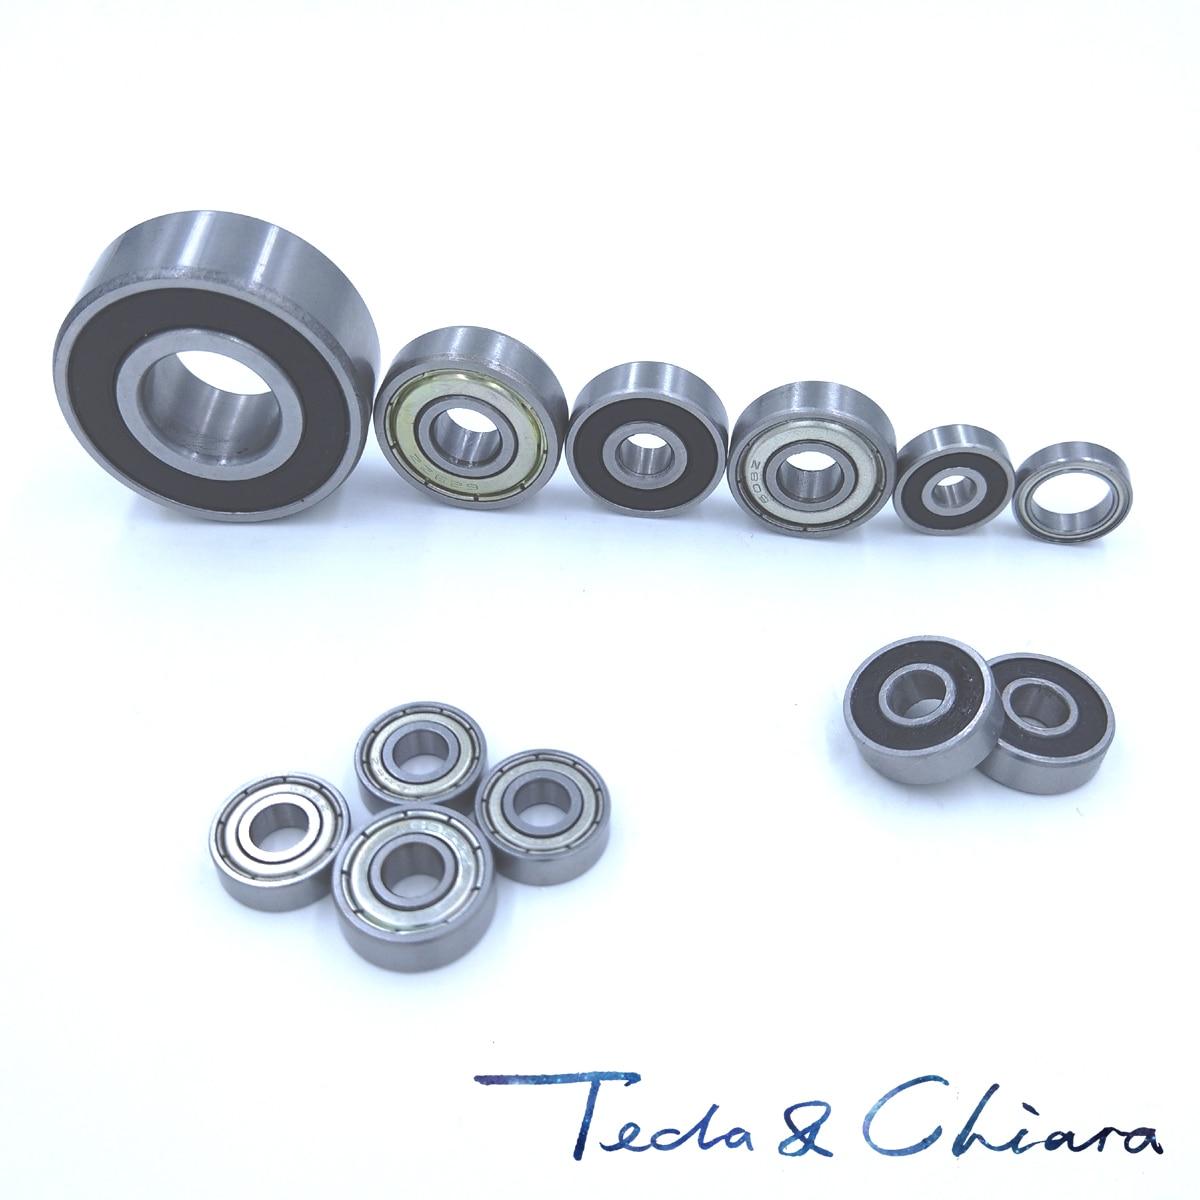 606 606ZZ 606RS 606-2Z 606Z 606-2RS ZZ RS RZ 2RZ los rodamientos de bolas de ranura profunda 6x17x6mm